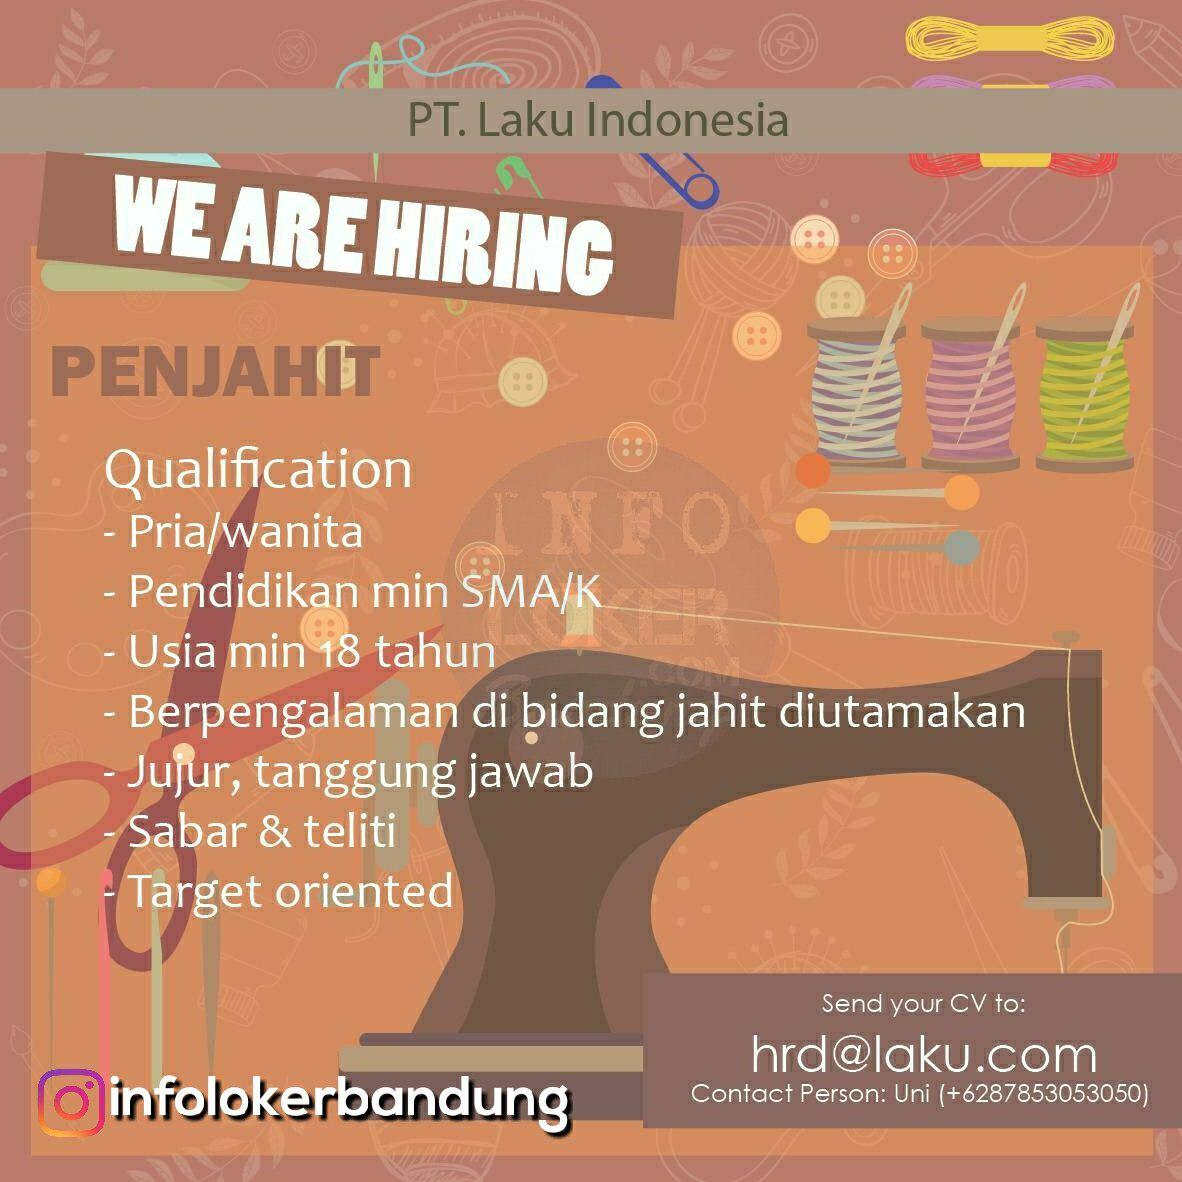 Lowongan Kerja Penjahit PT. Laku Indonesia Bandung Desember 2018